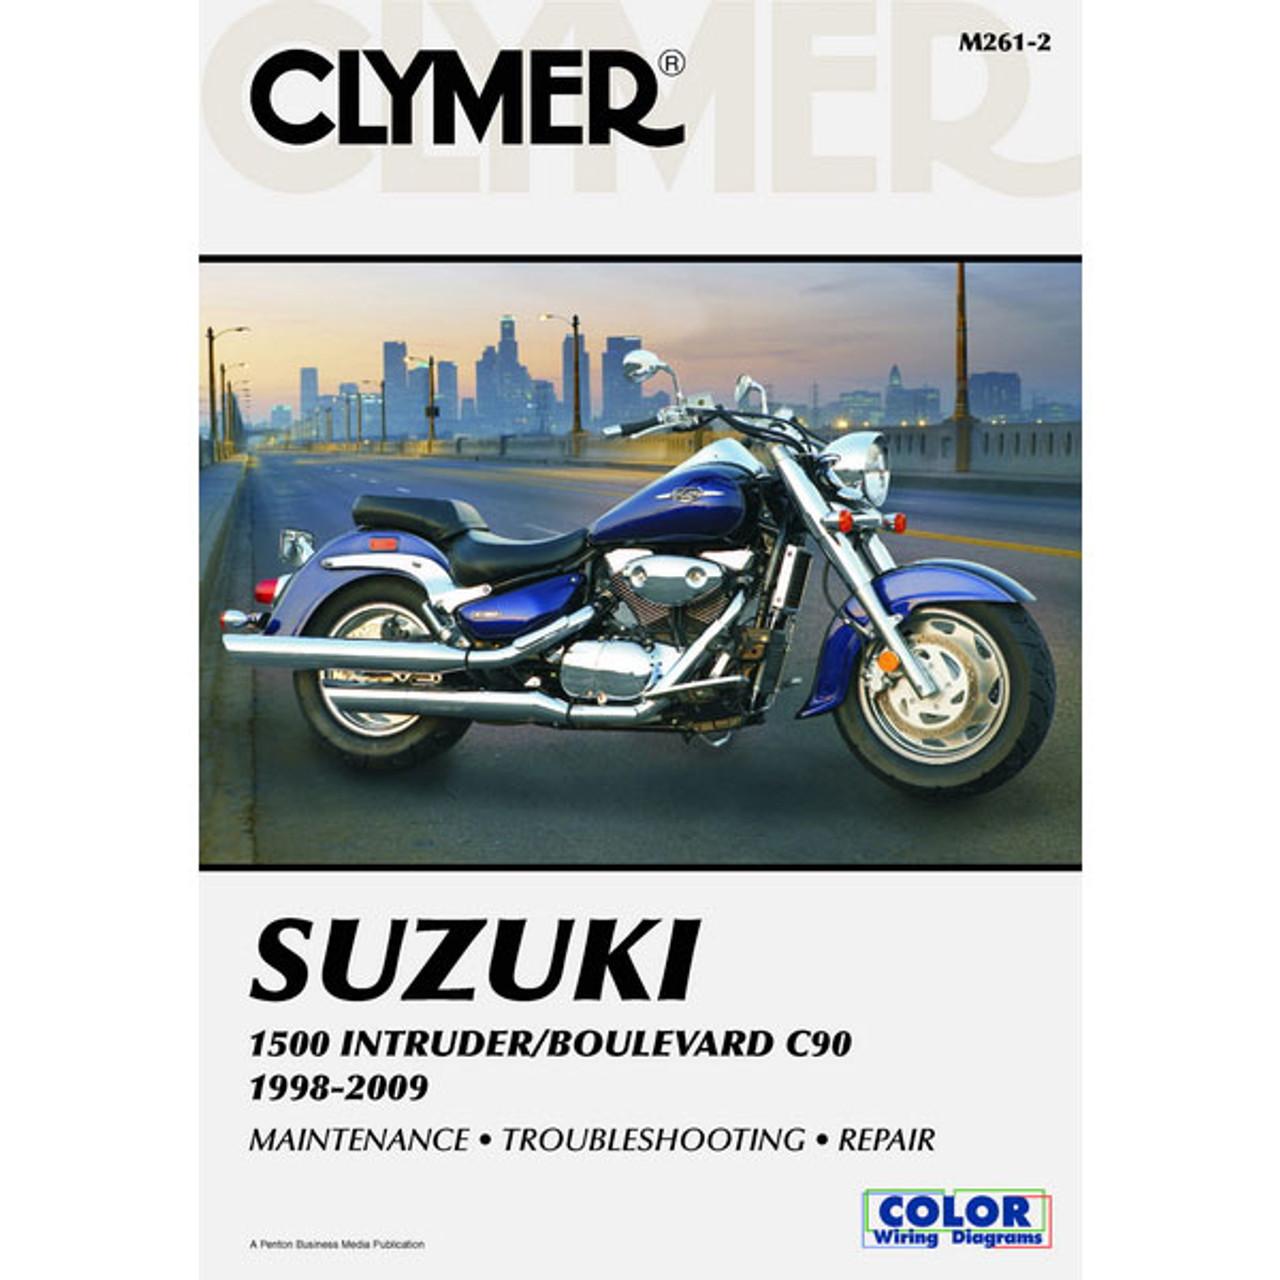 clymer suzuki 1500 intruder boulevard c90 98 09 service manual rh sportbiketrackgear com 93 Intruder 800 Suzuki Intruder 900